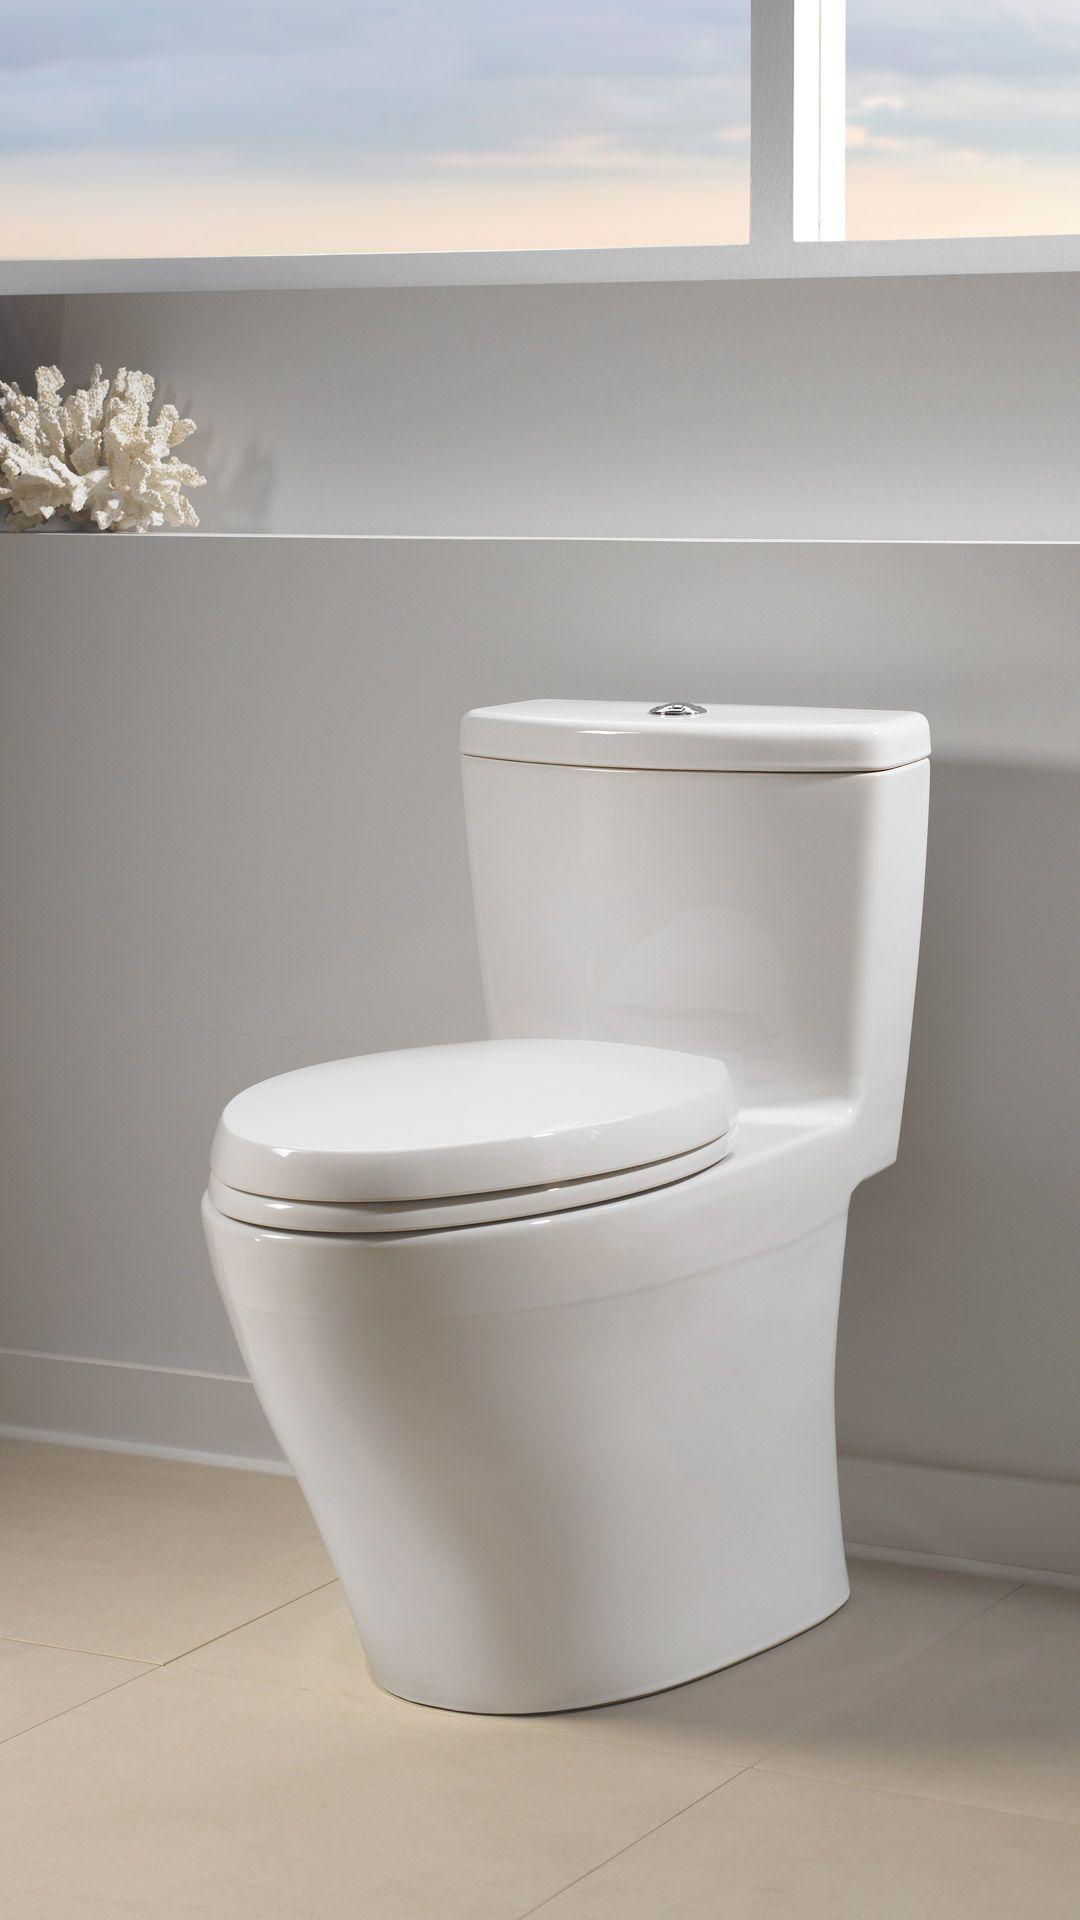 Aquia® Onepiece Toilet, 16 Gpf & 09 Gpf, Elongated Bowl